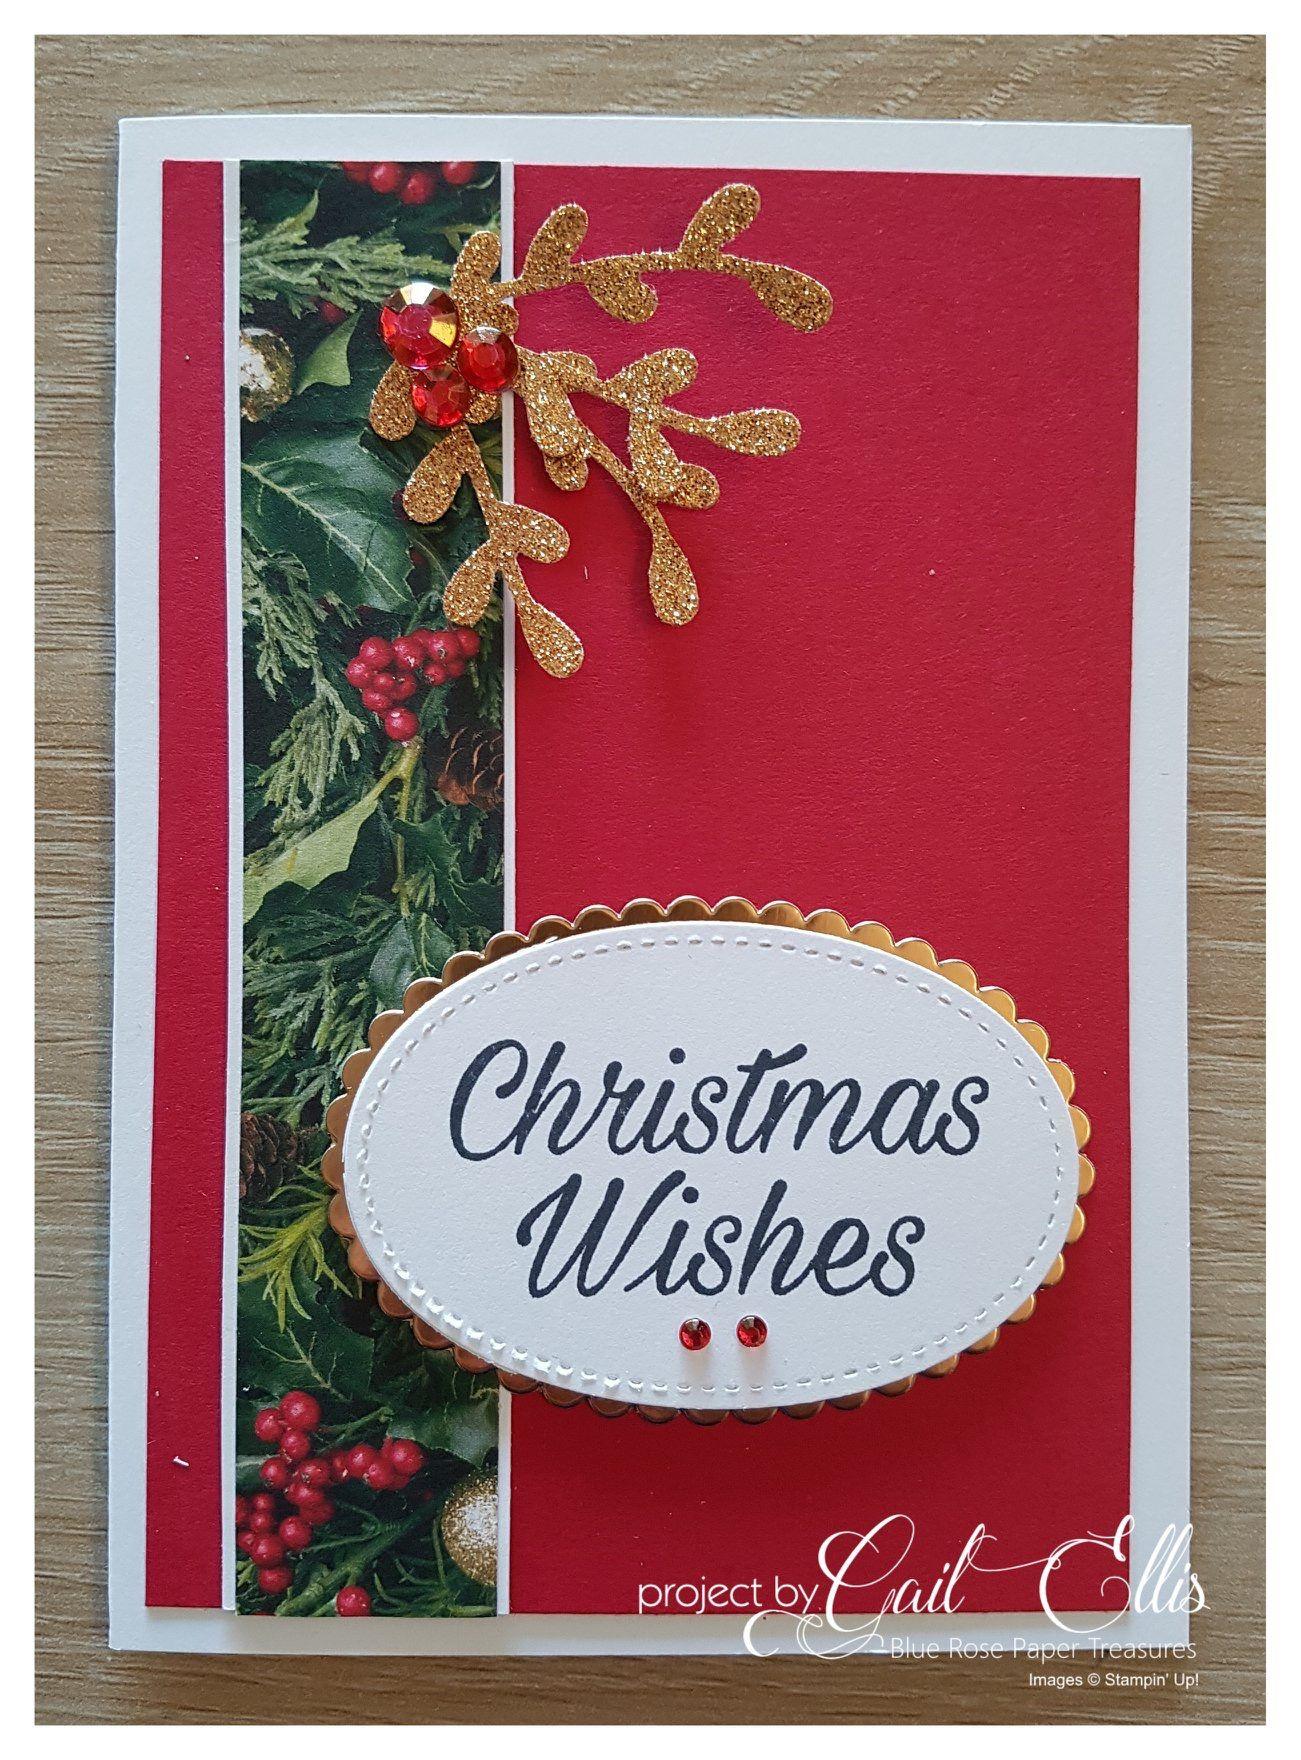 Pin by Linda Davies on Christmas cards | Pinterest | Christmas Cards ...